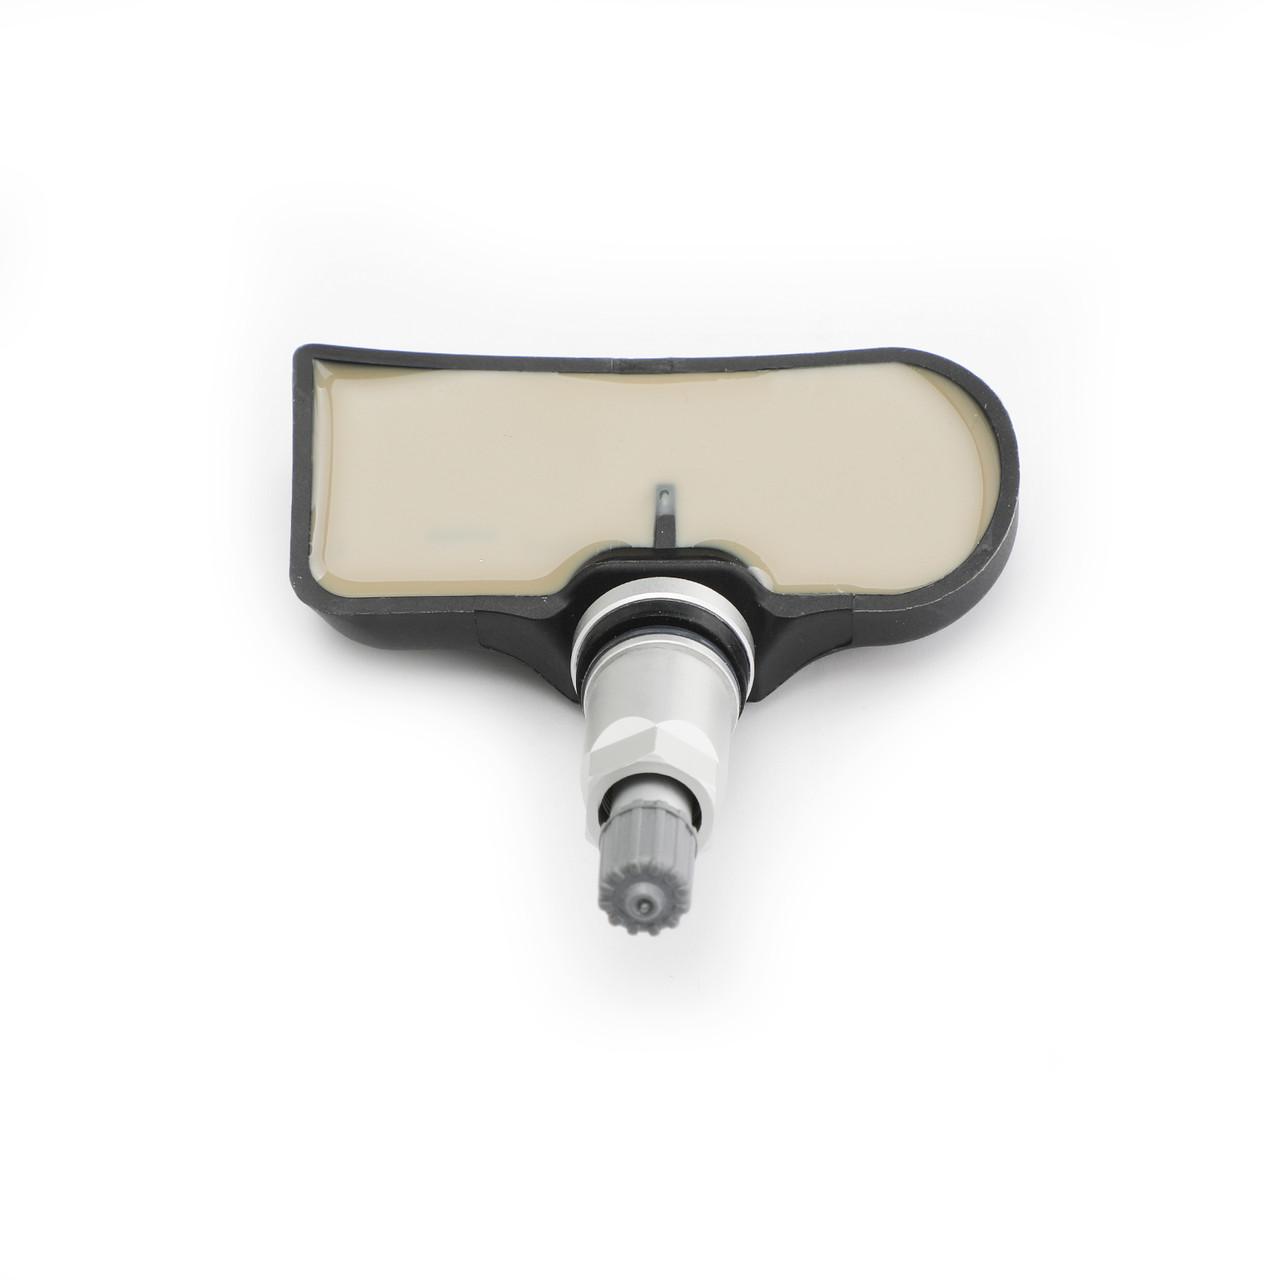 1PCS Tire Pressure Monitoring System Sensor 56053031AD For Avenger 12-13 Caliber 11-13 Journey 09-10 Charger 08 Black